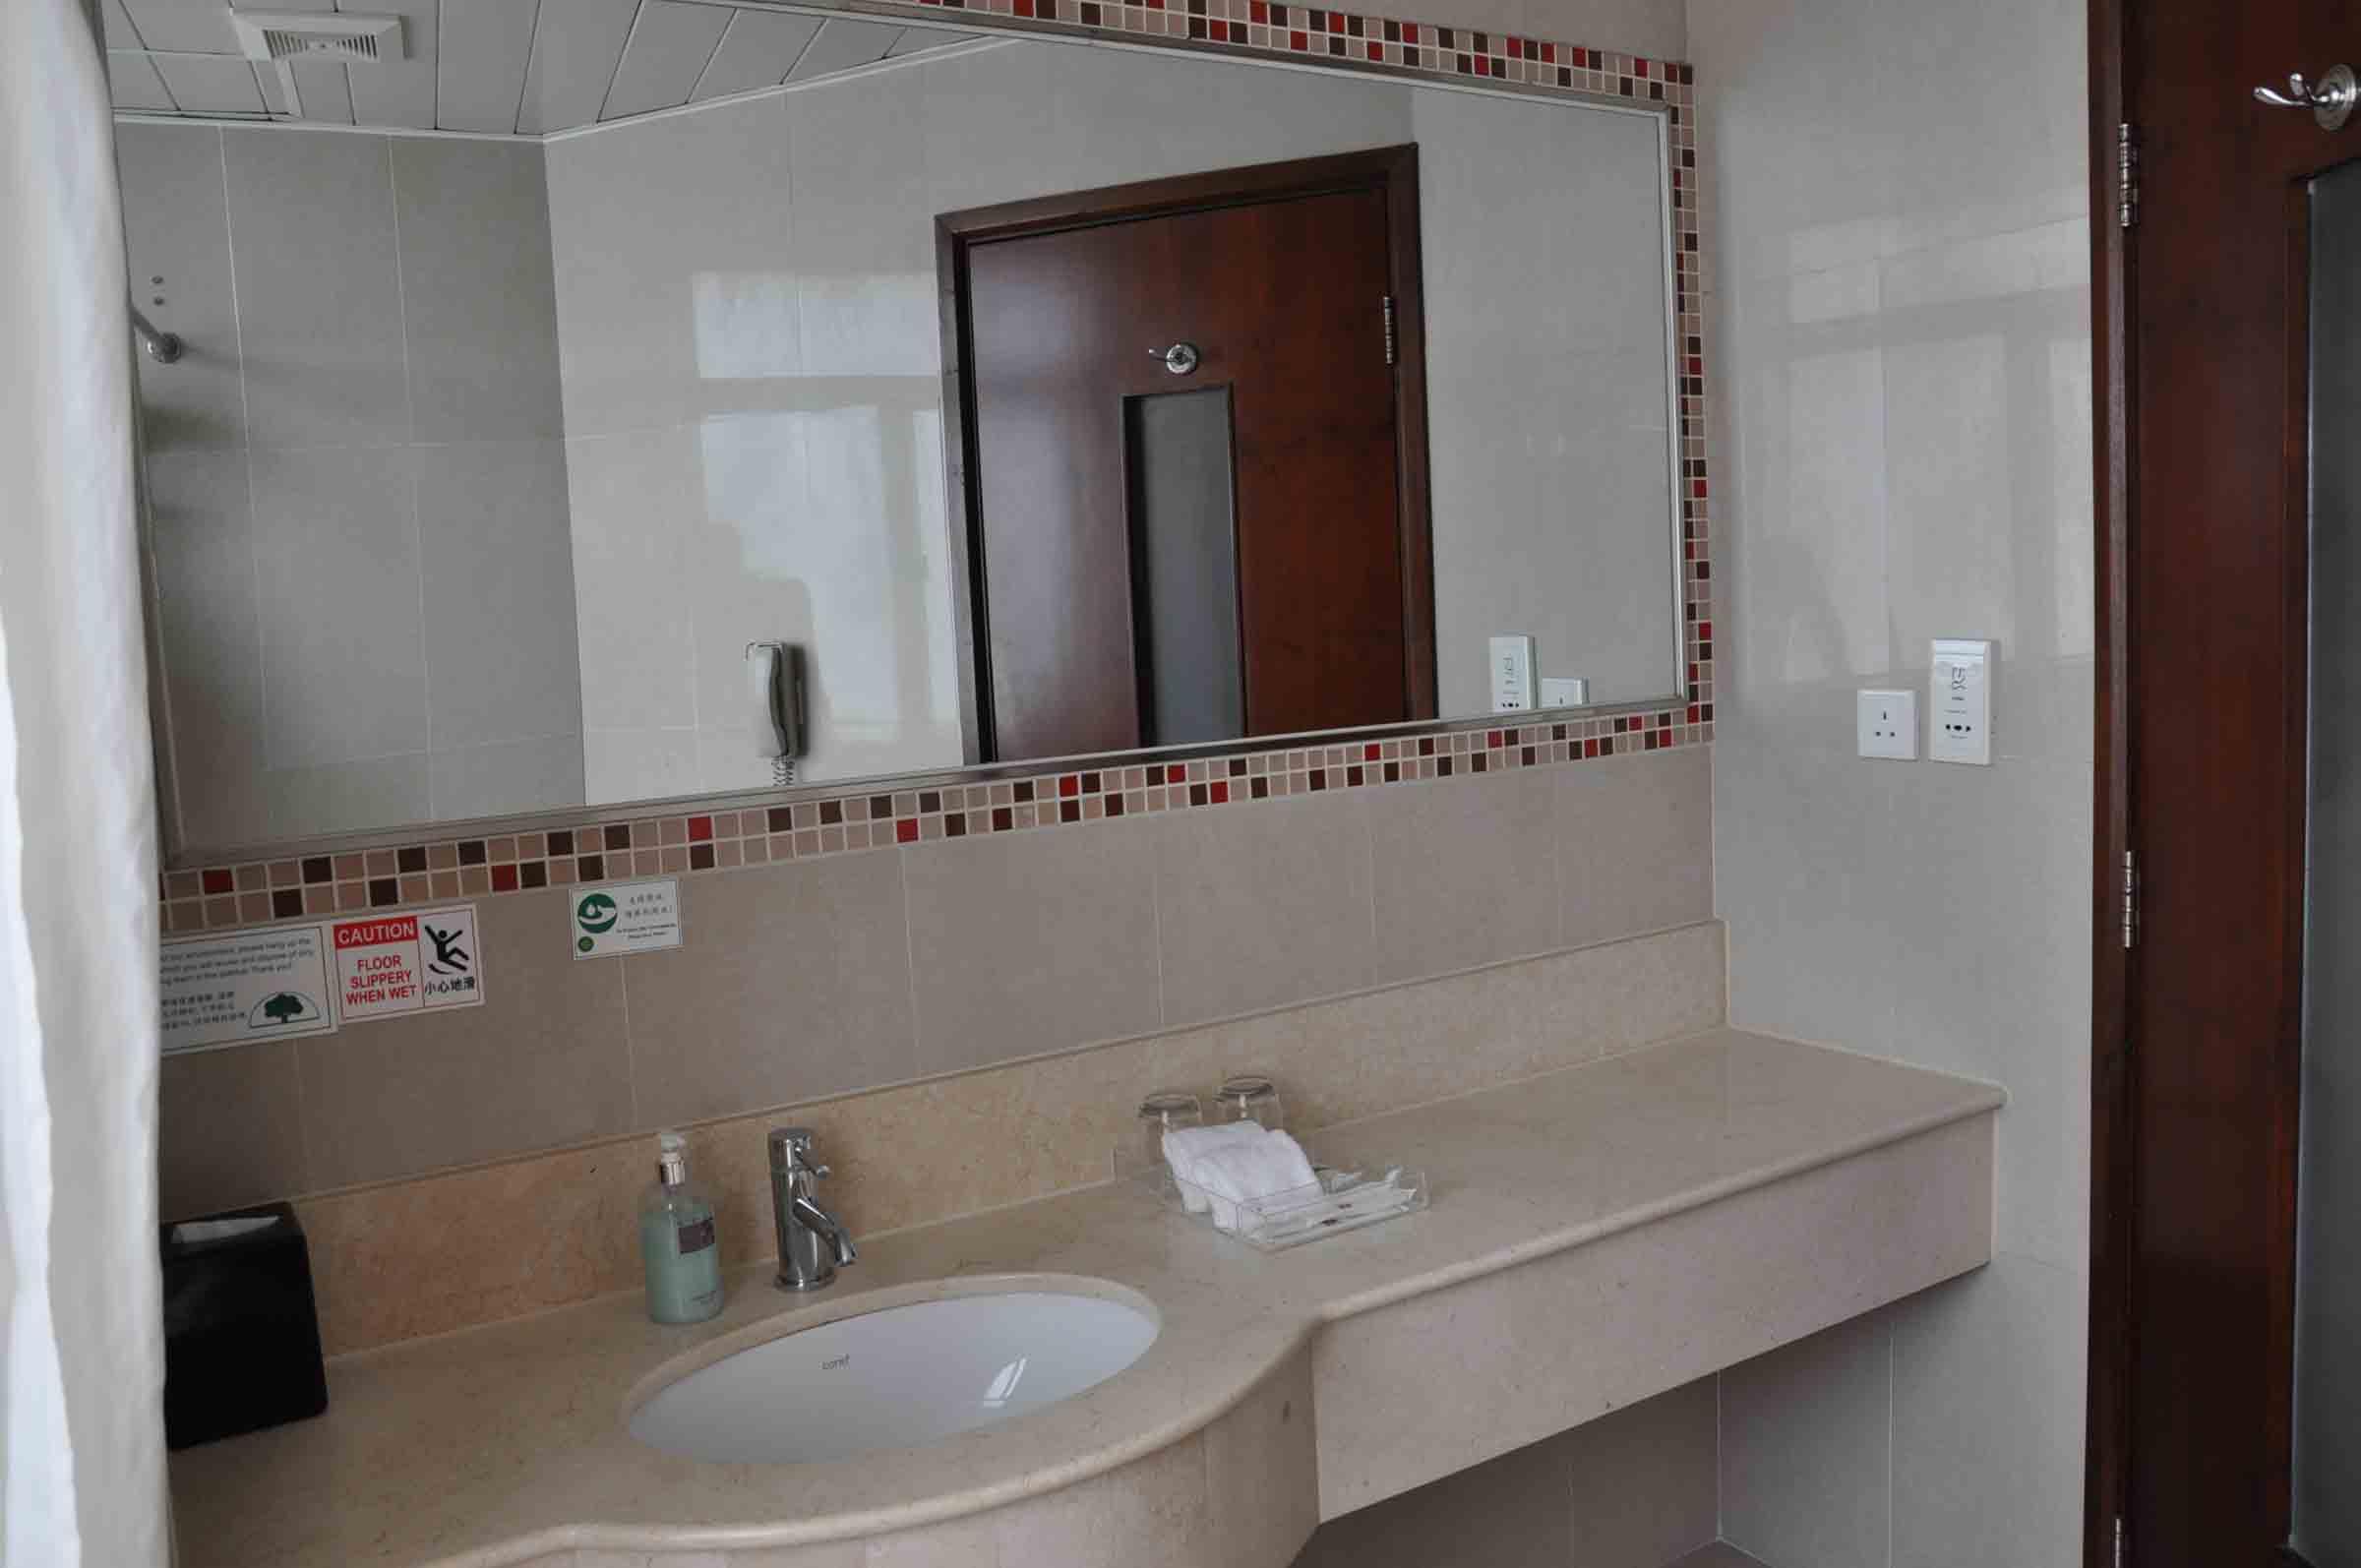 Grand Dragon Hotel Standard Room bathroom